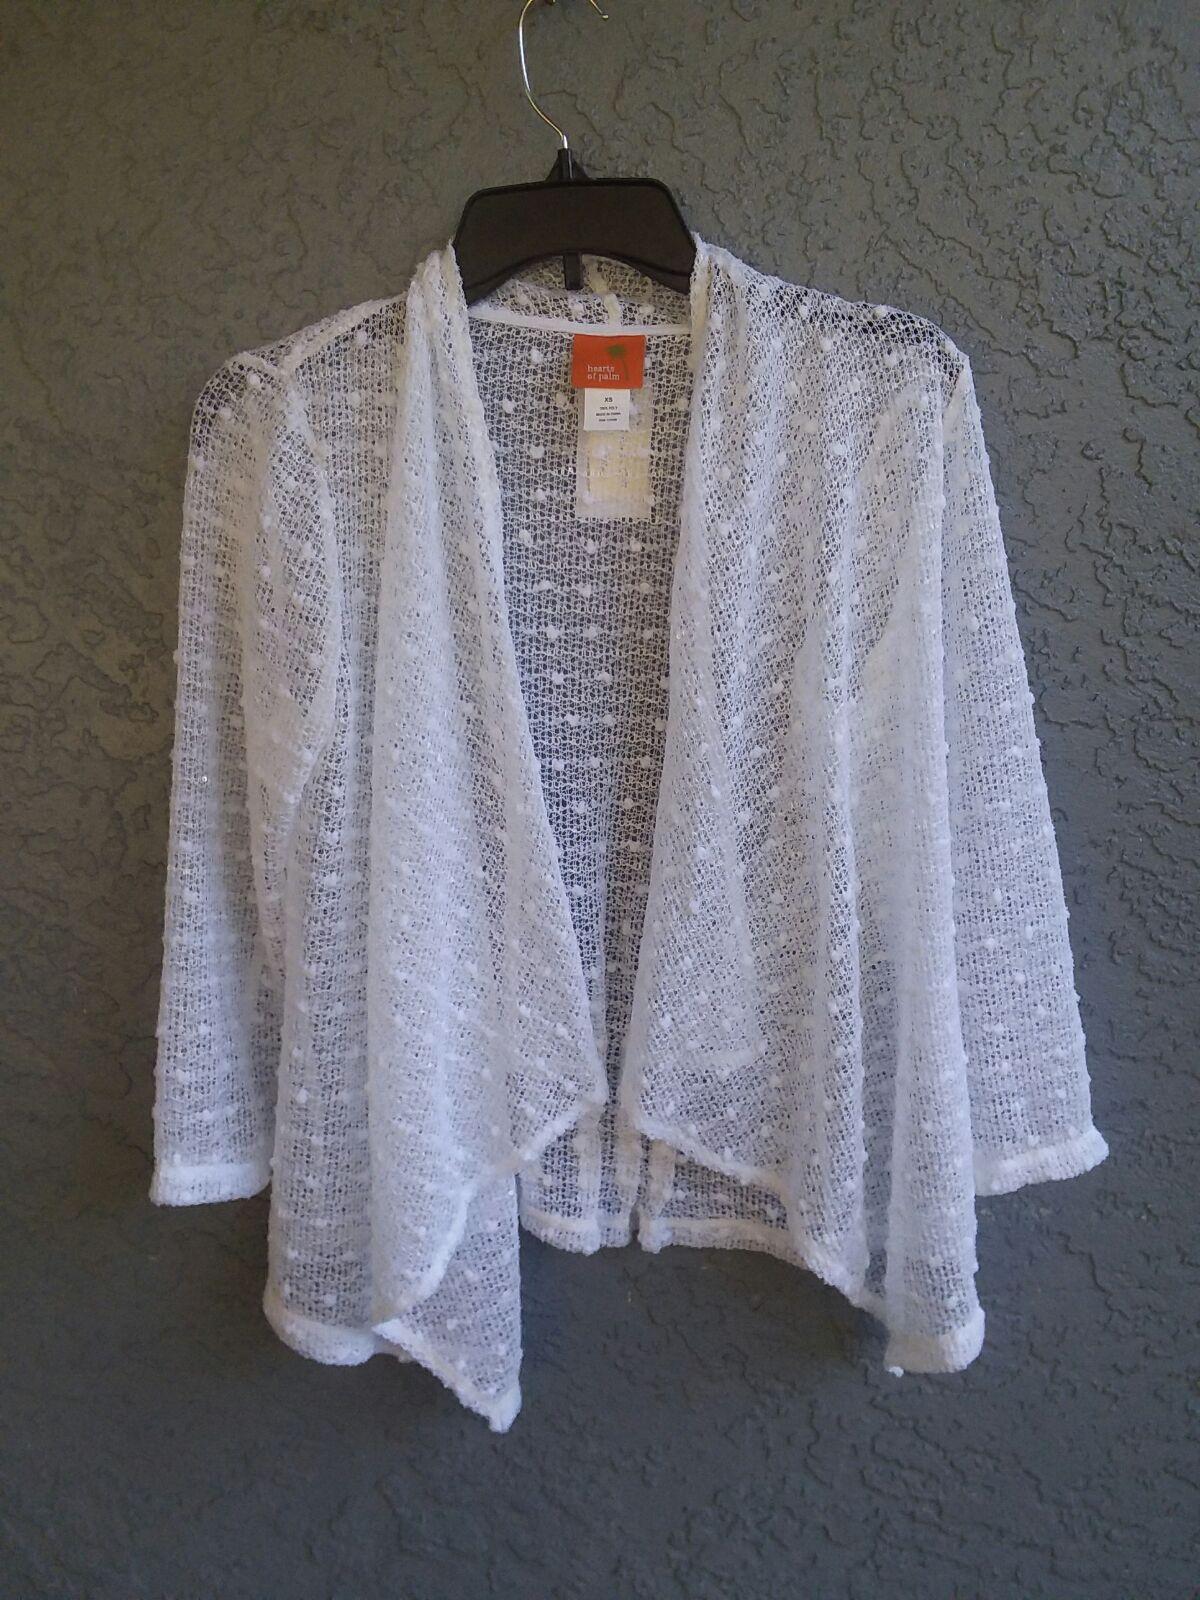 Sheer white cardigan - Mercari: BUY & SELL THINGS YOU LOVE